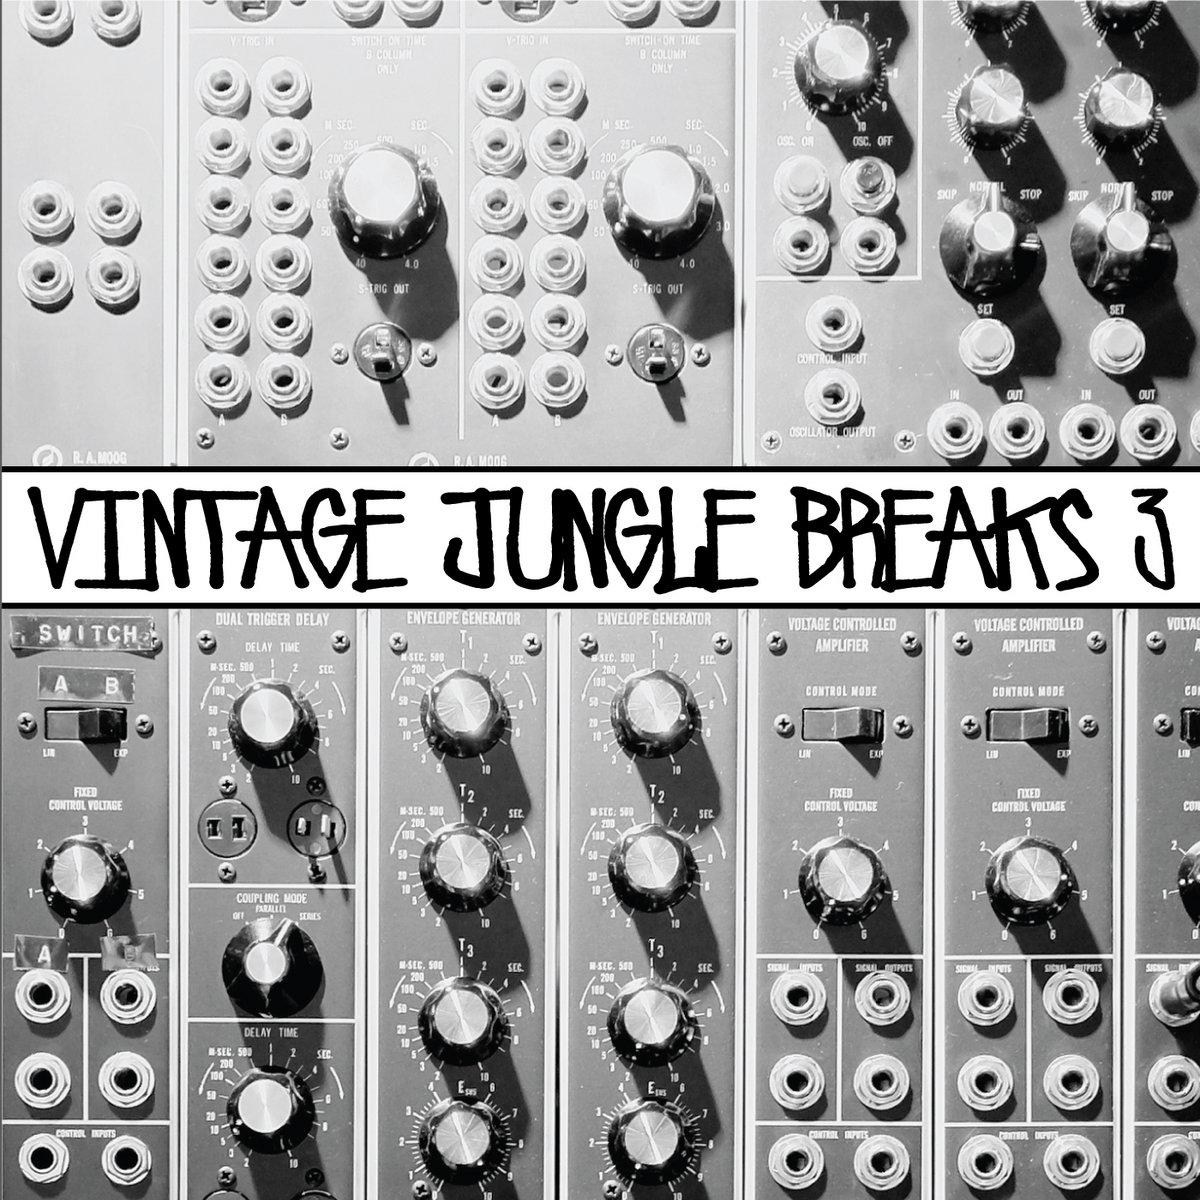 Vintage Jungle Breaks 3 | 6Blocc